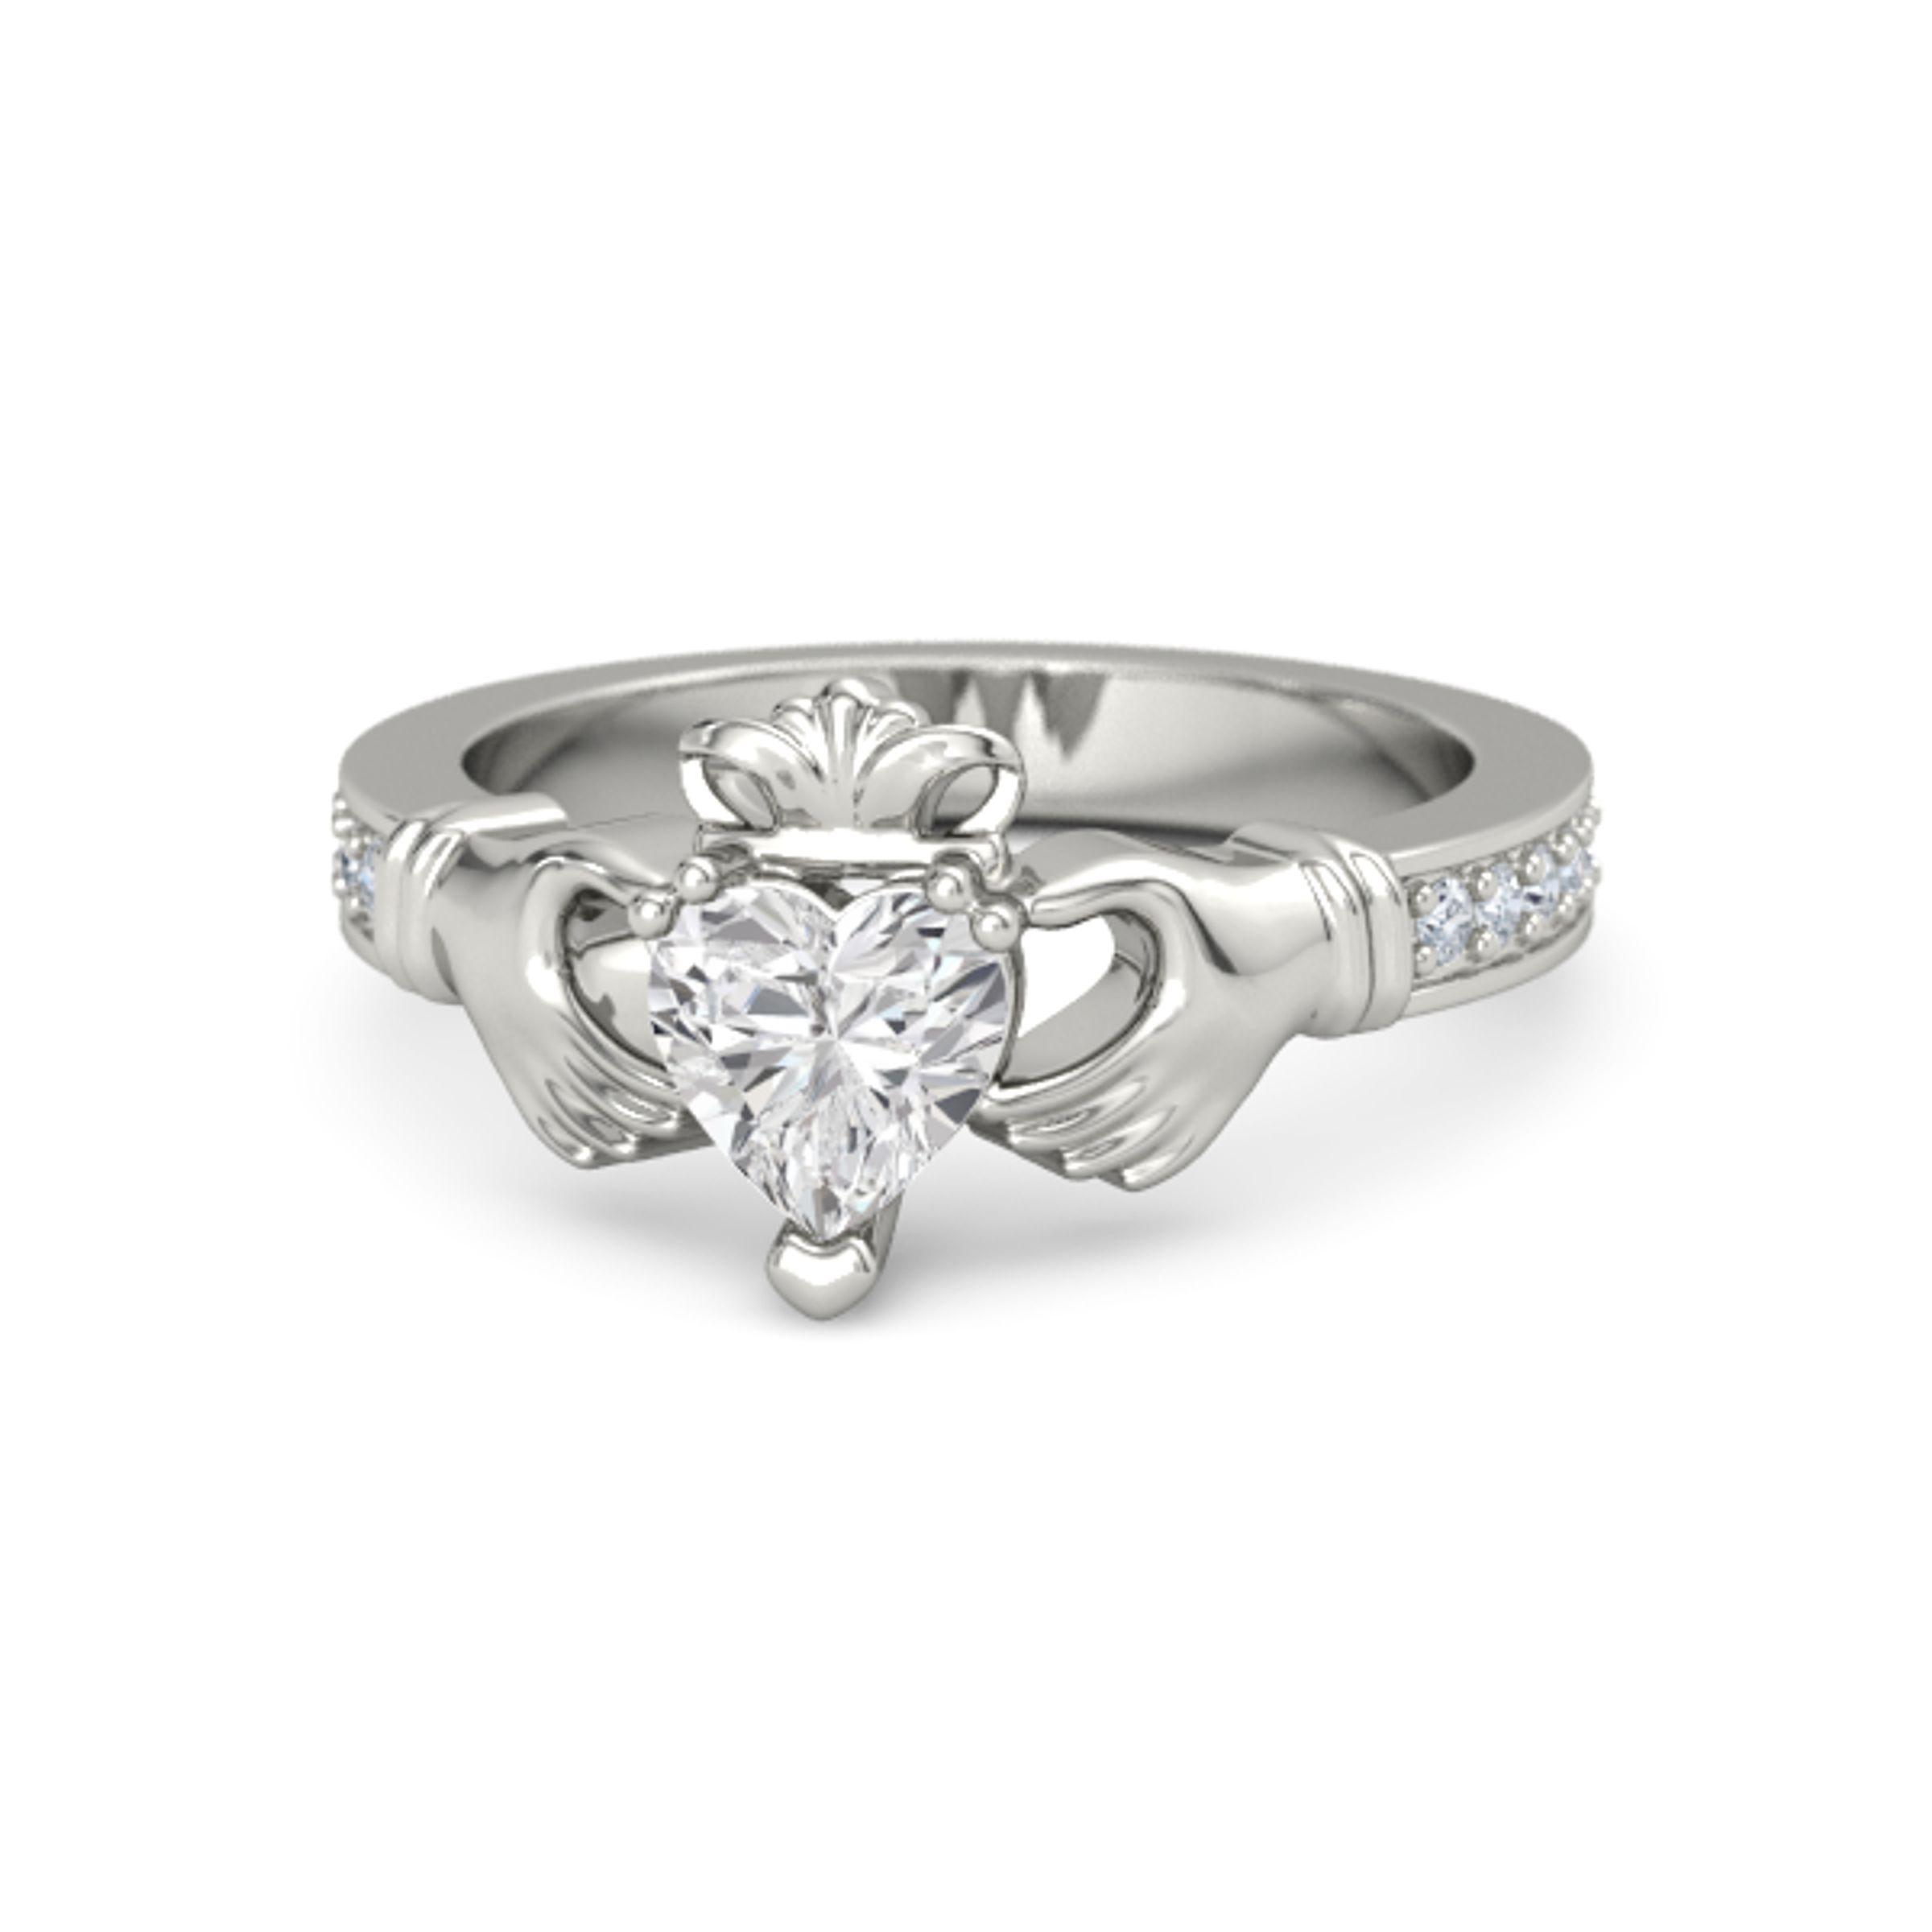 Heart White Sapphire 14k White Gold Ring With Diamond Claddagh Ring Gemvara